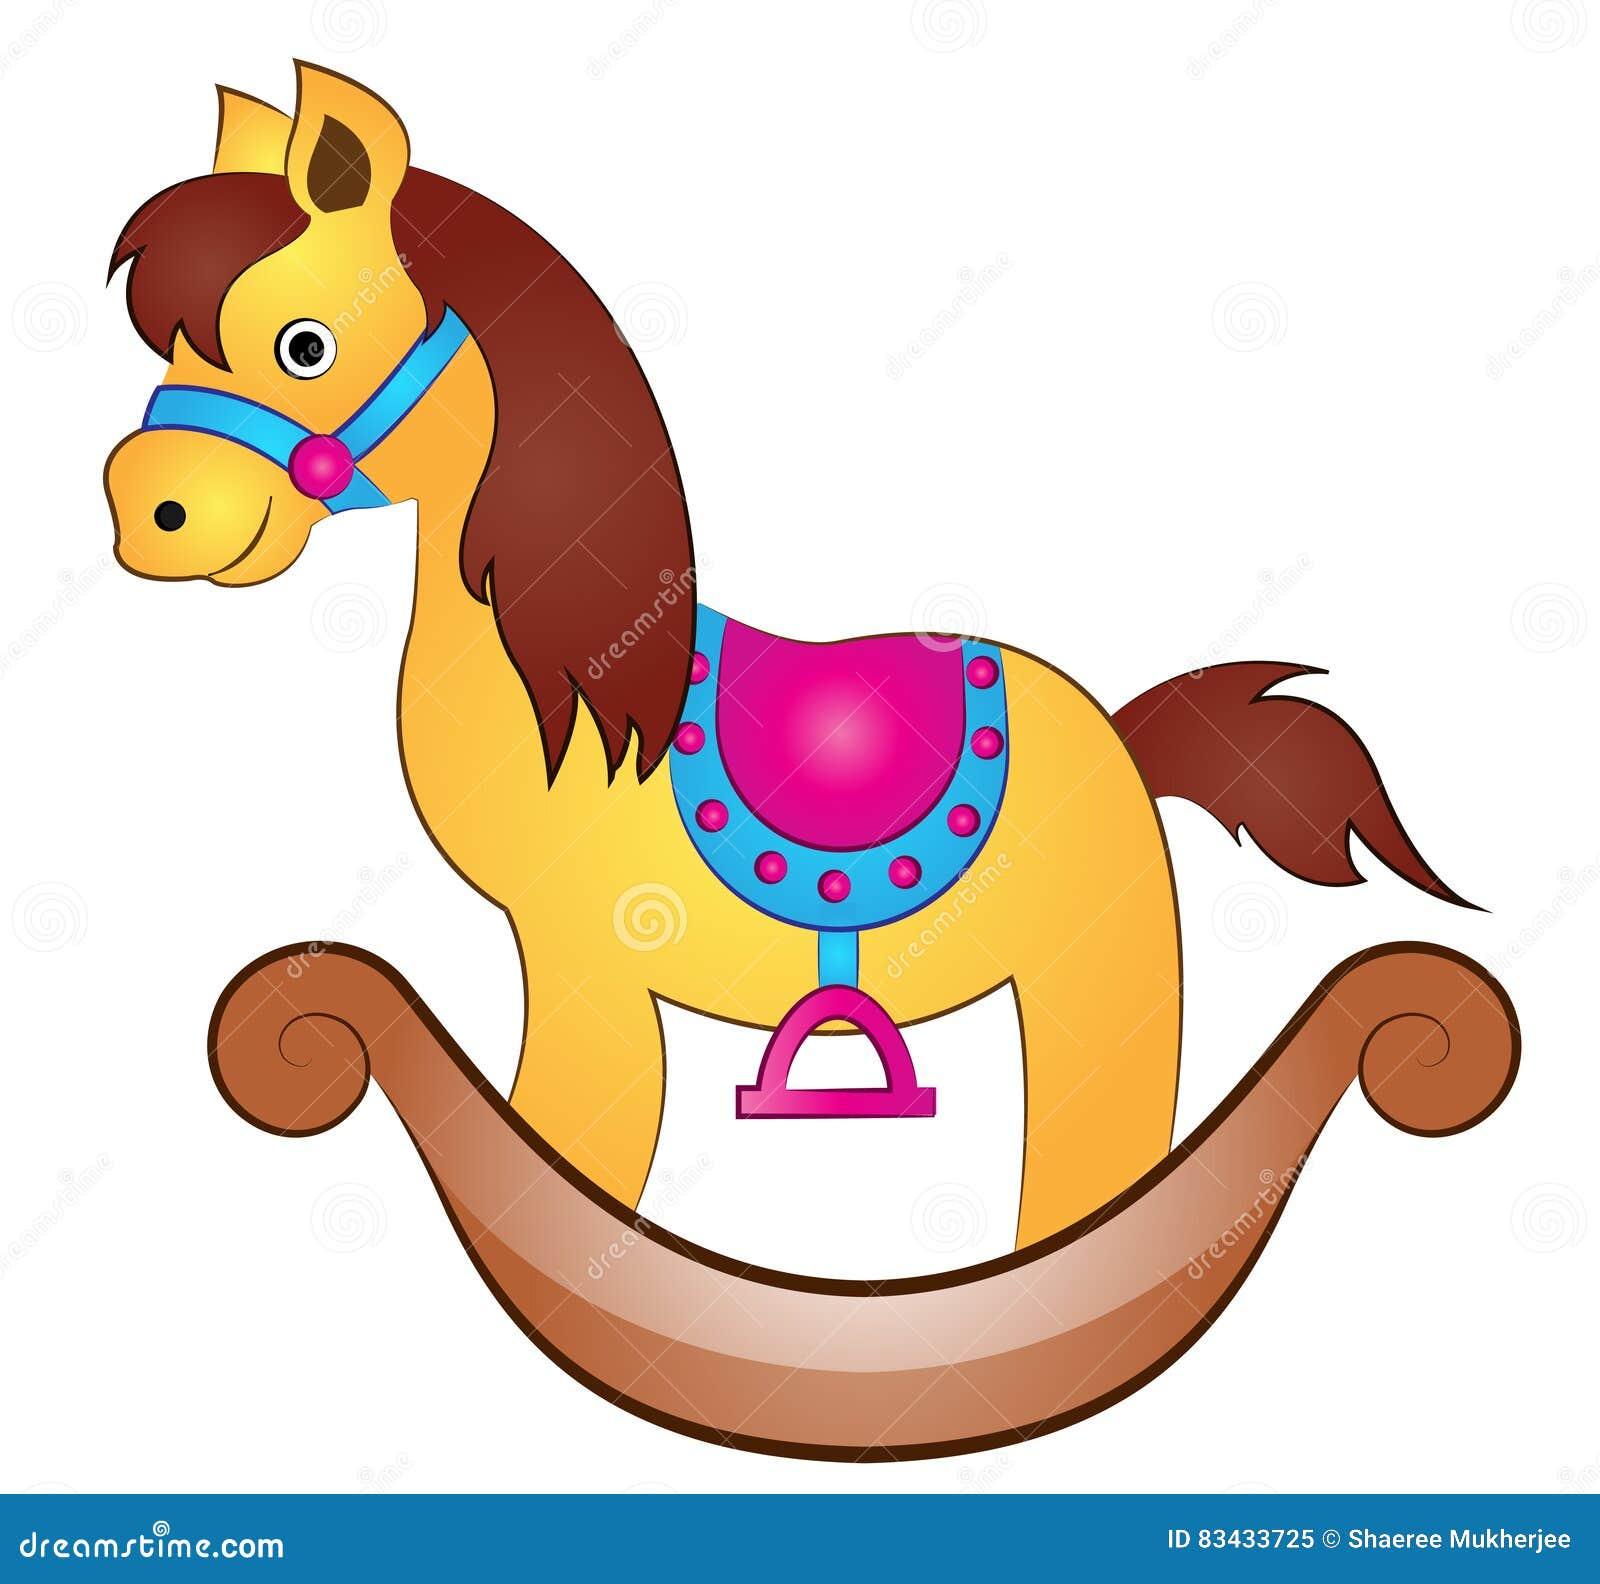 Cartoon Toy Horse Stock Vector Illustration Of Craft 83433725